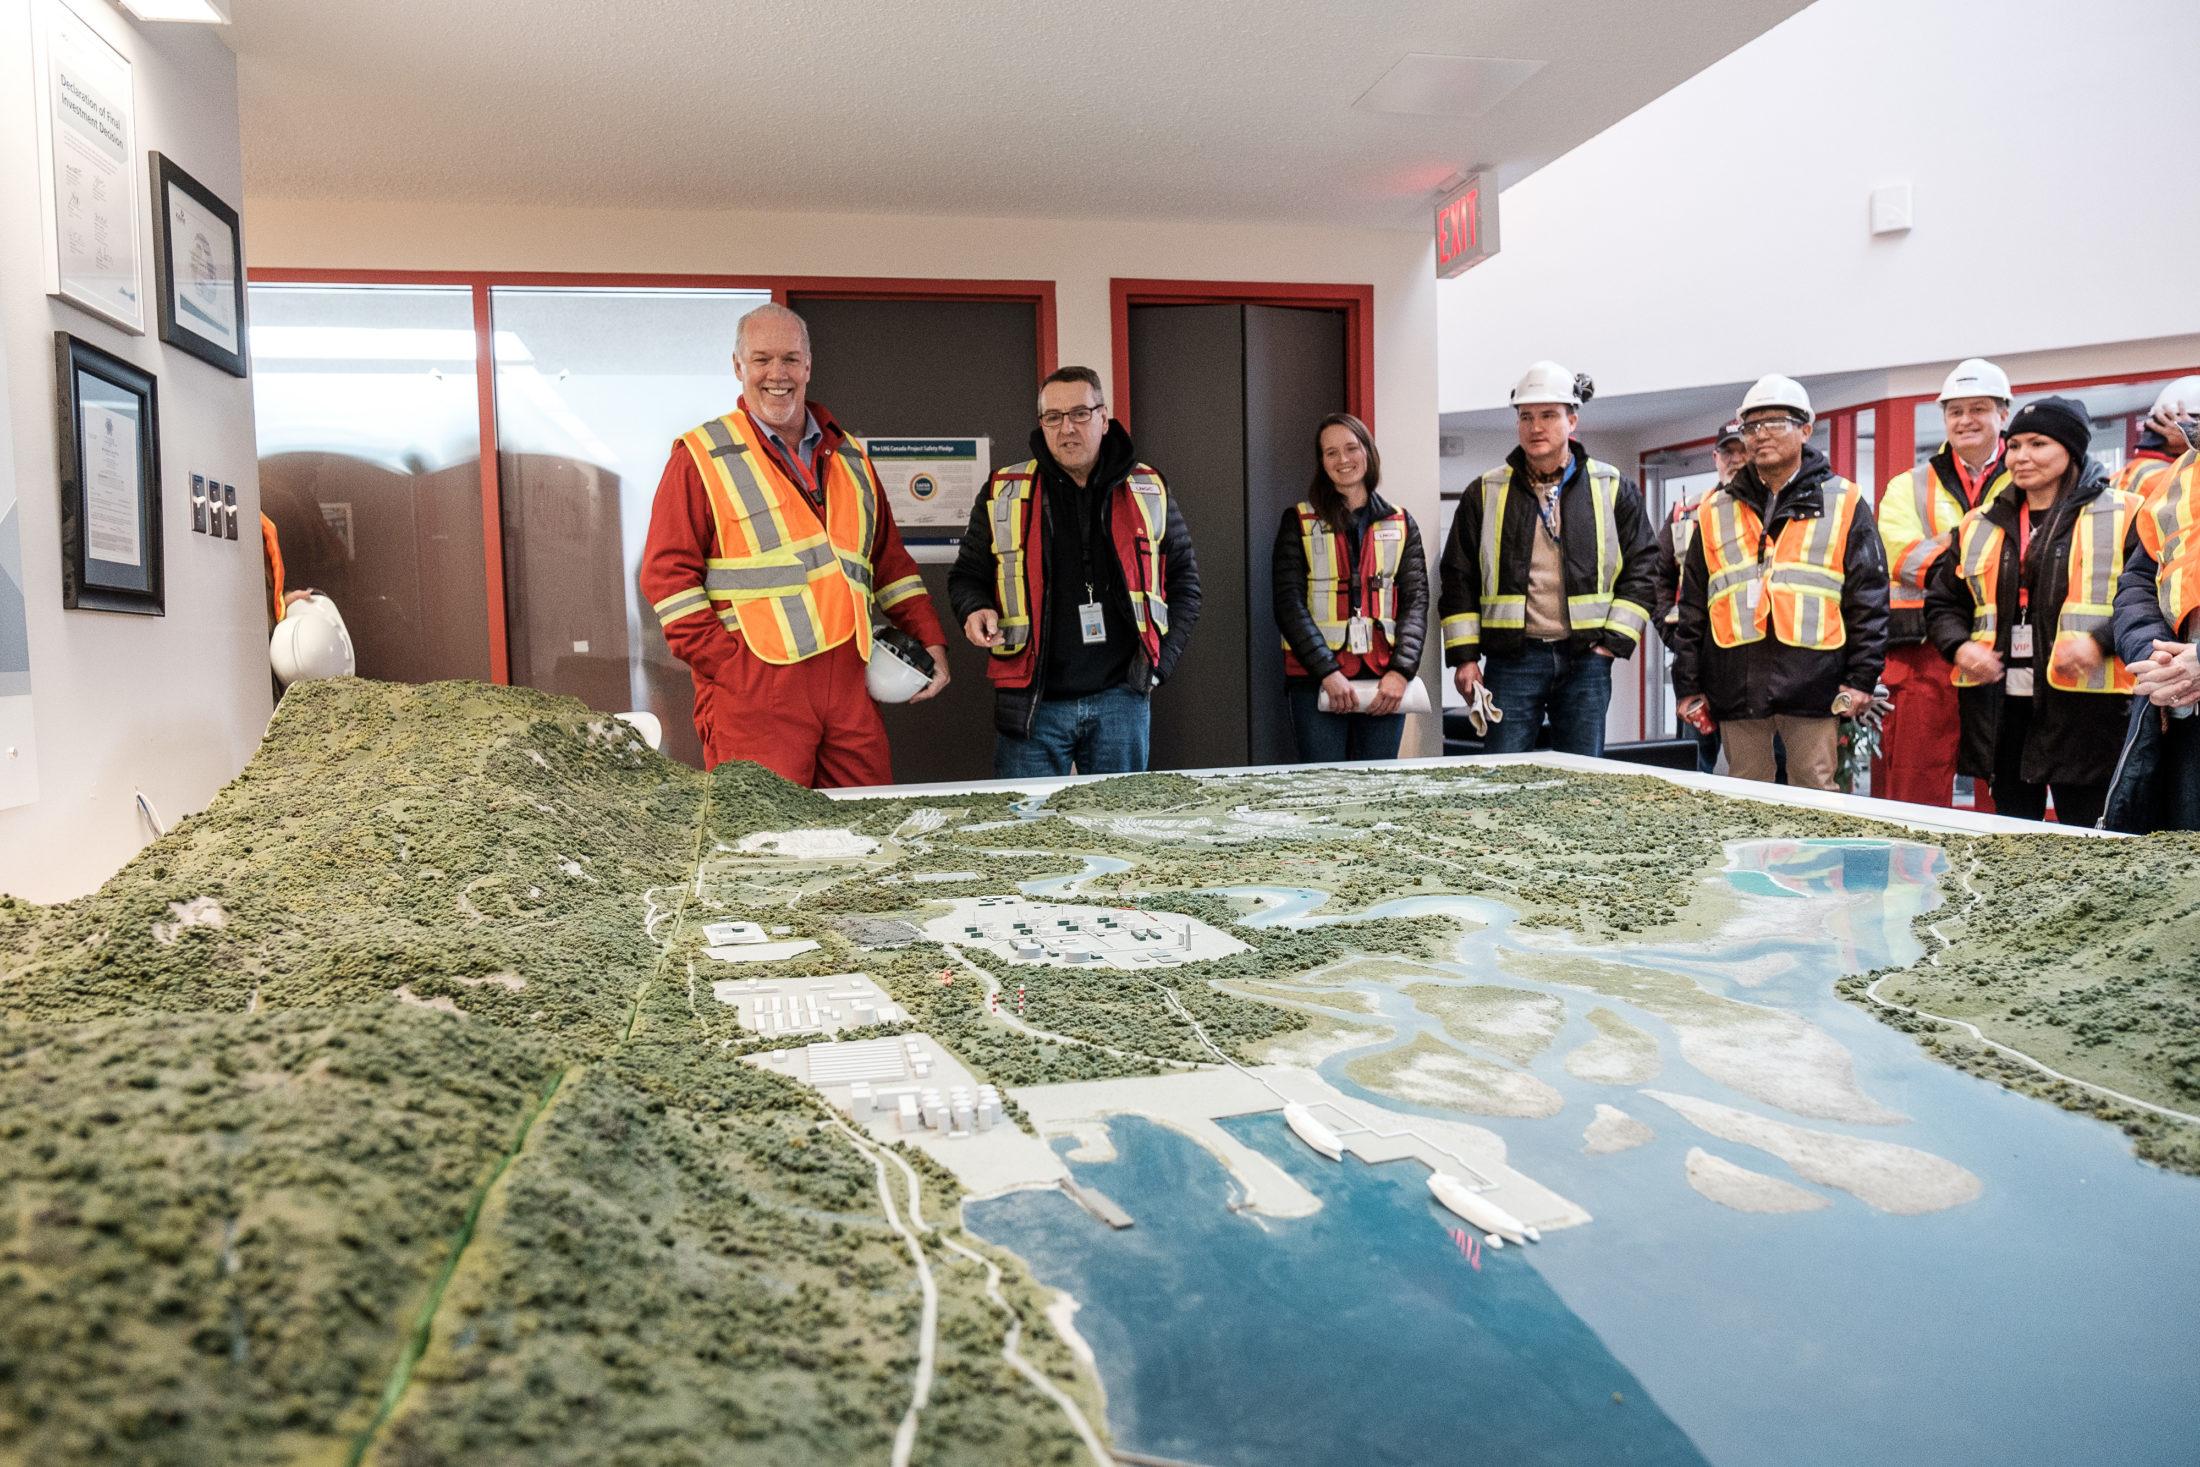 Premier John Horgan touring LNG Canada site Kitimat